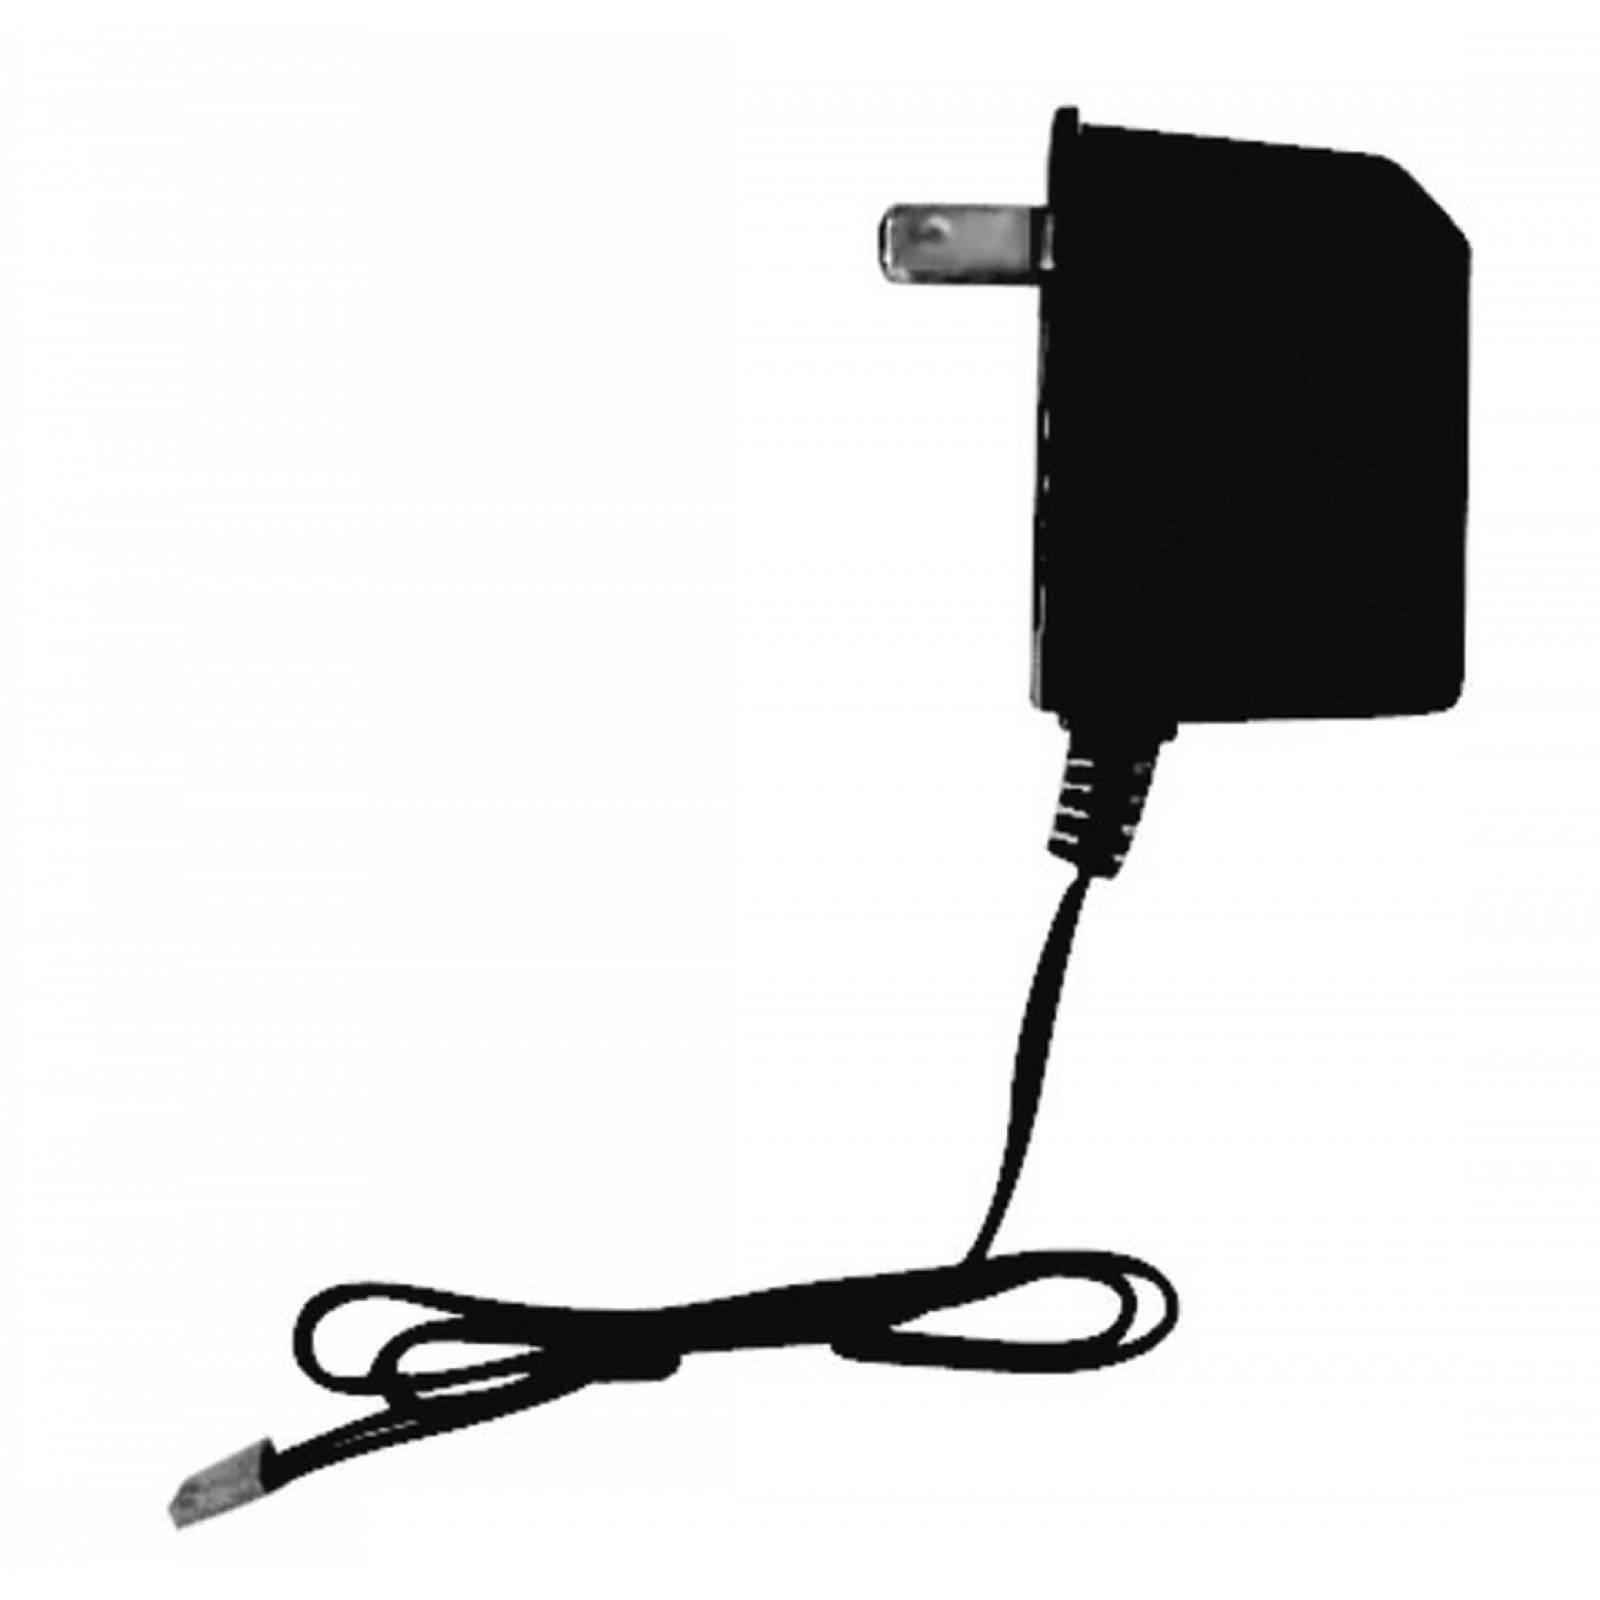 Adaptador de corriente de 9 Volts 25.2531.20 URREA